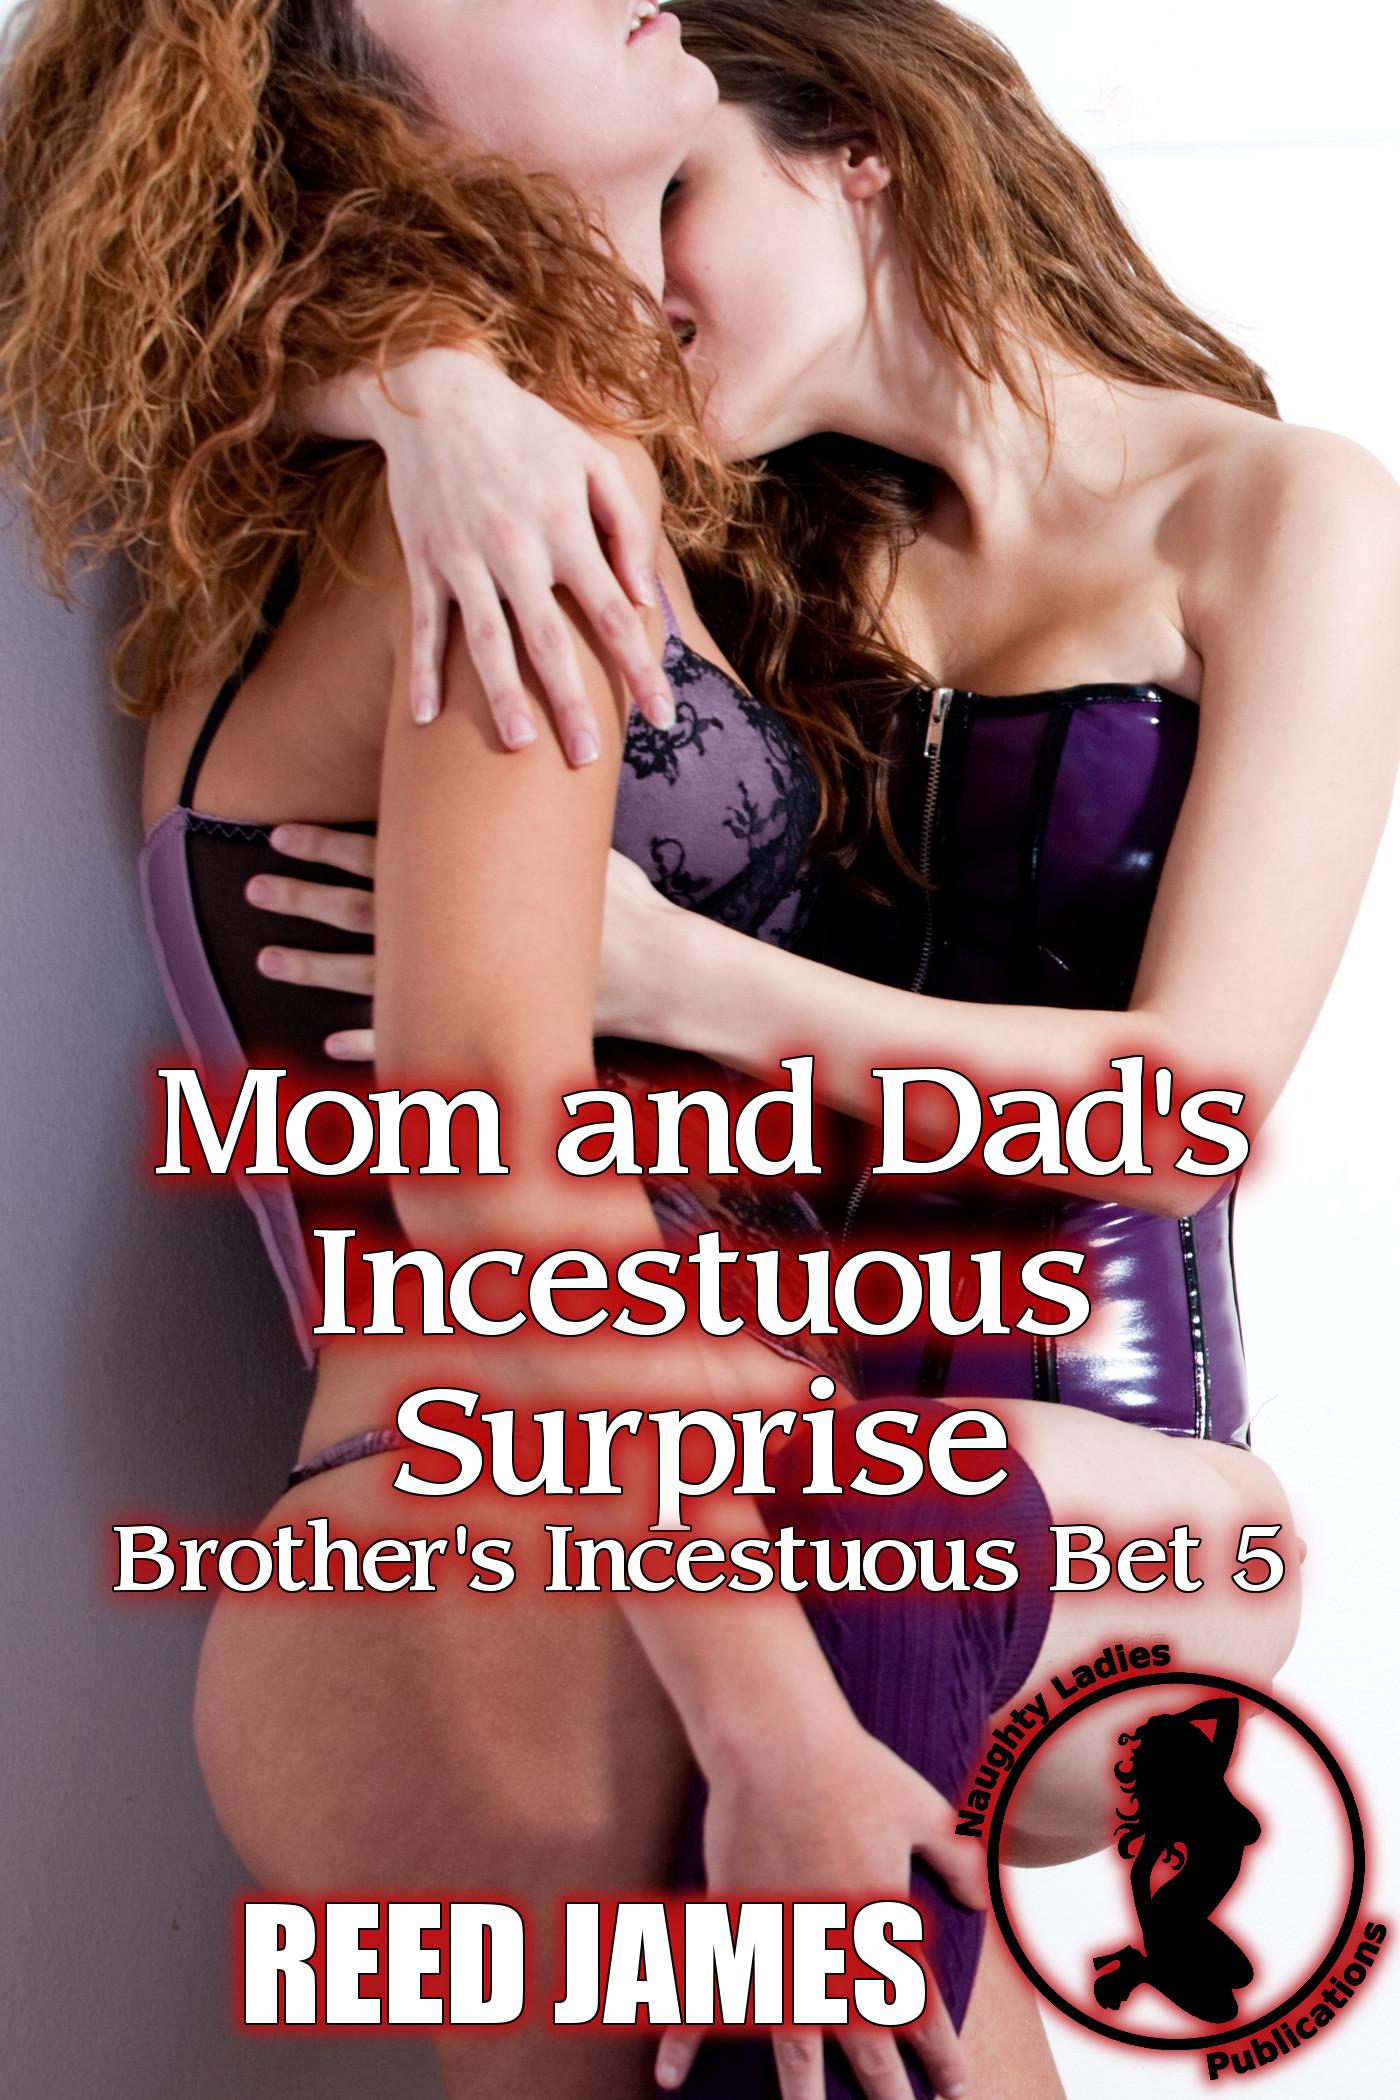 Surprise mom incest captions are